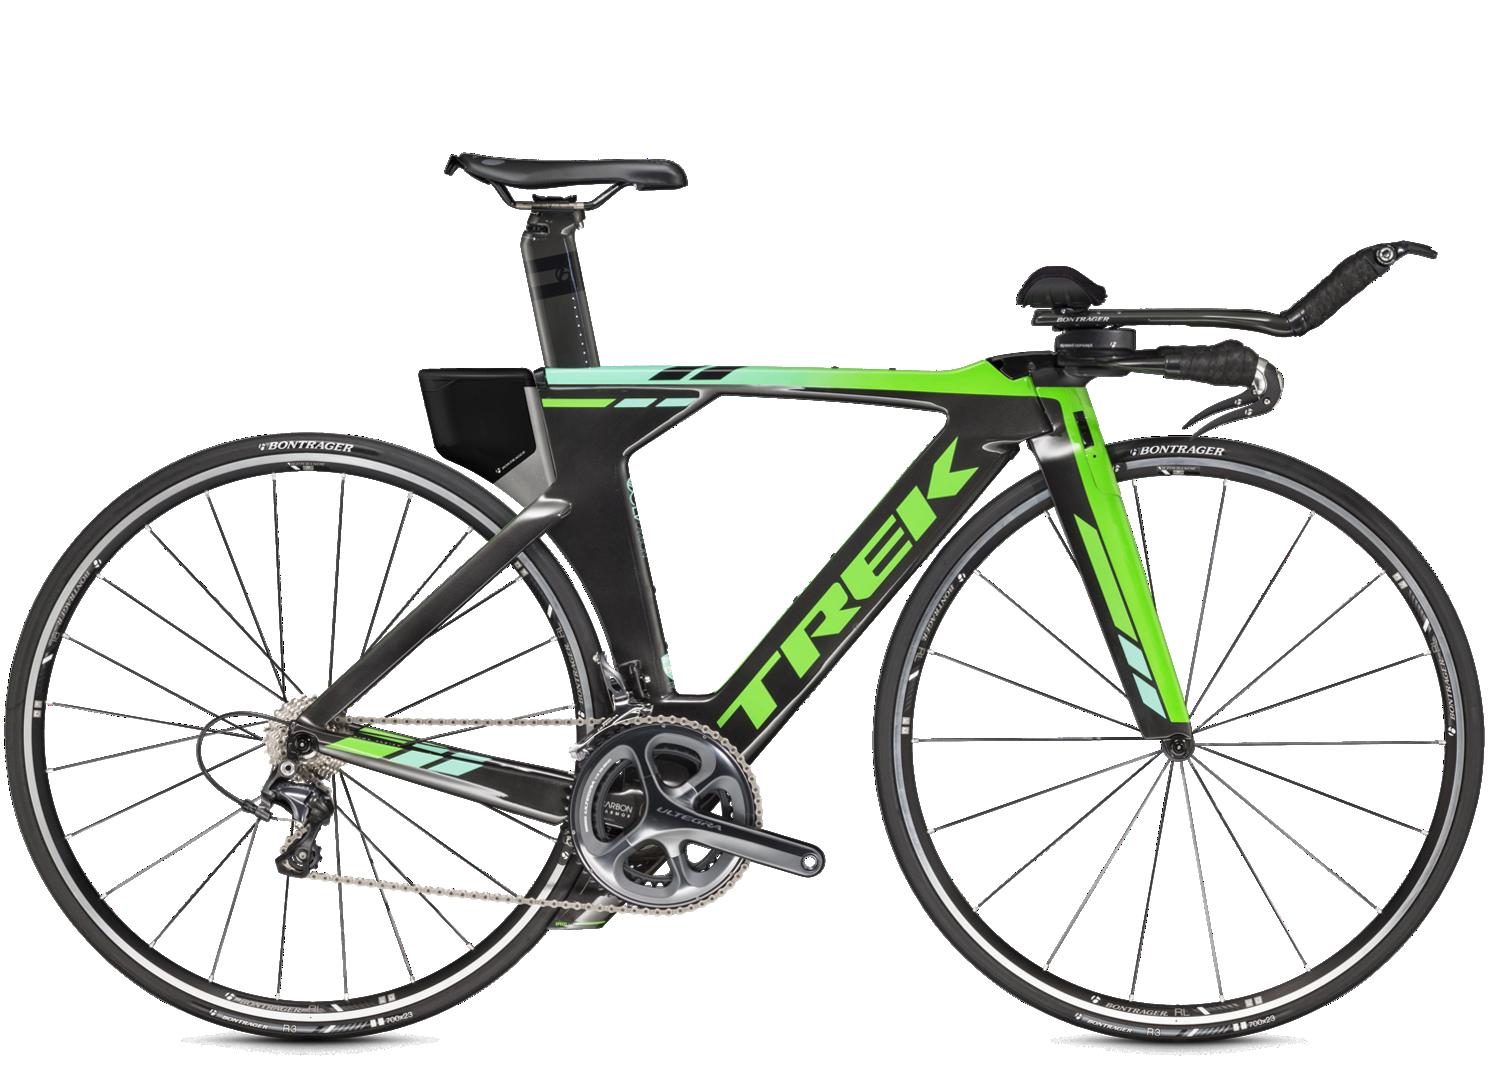 Speed Concept 9 5 Wsd Trek Bicycle